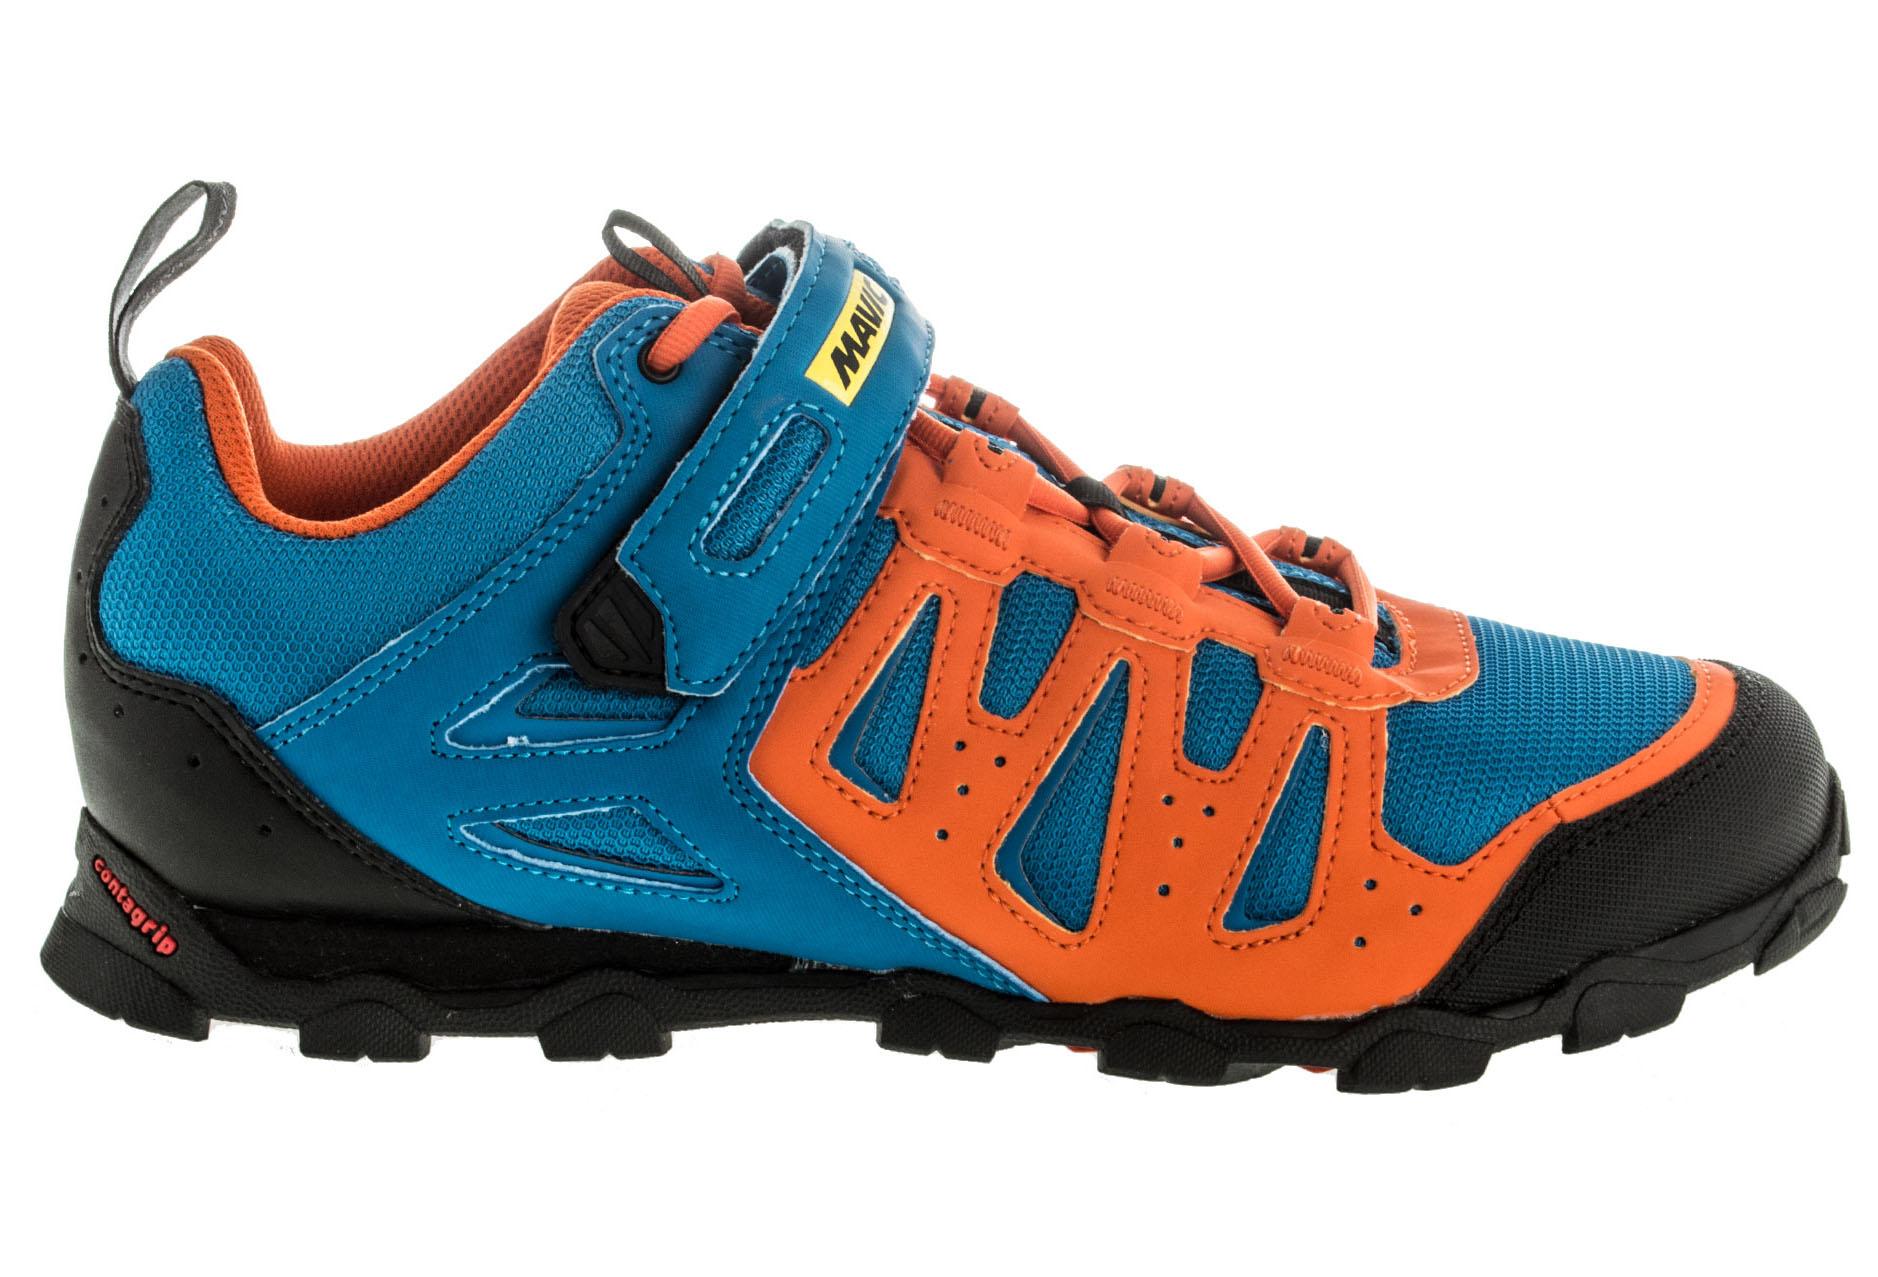 Nike Trek Shoes